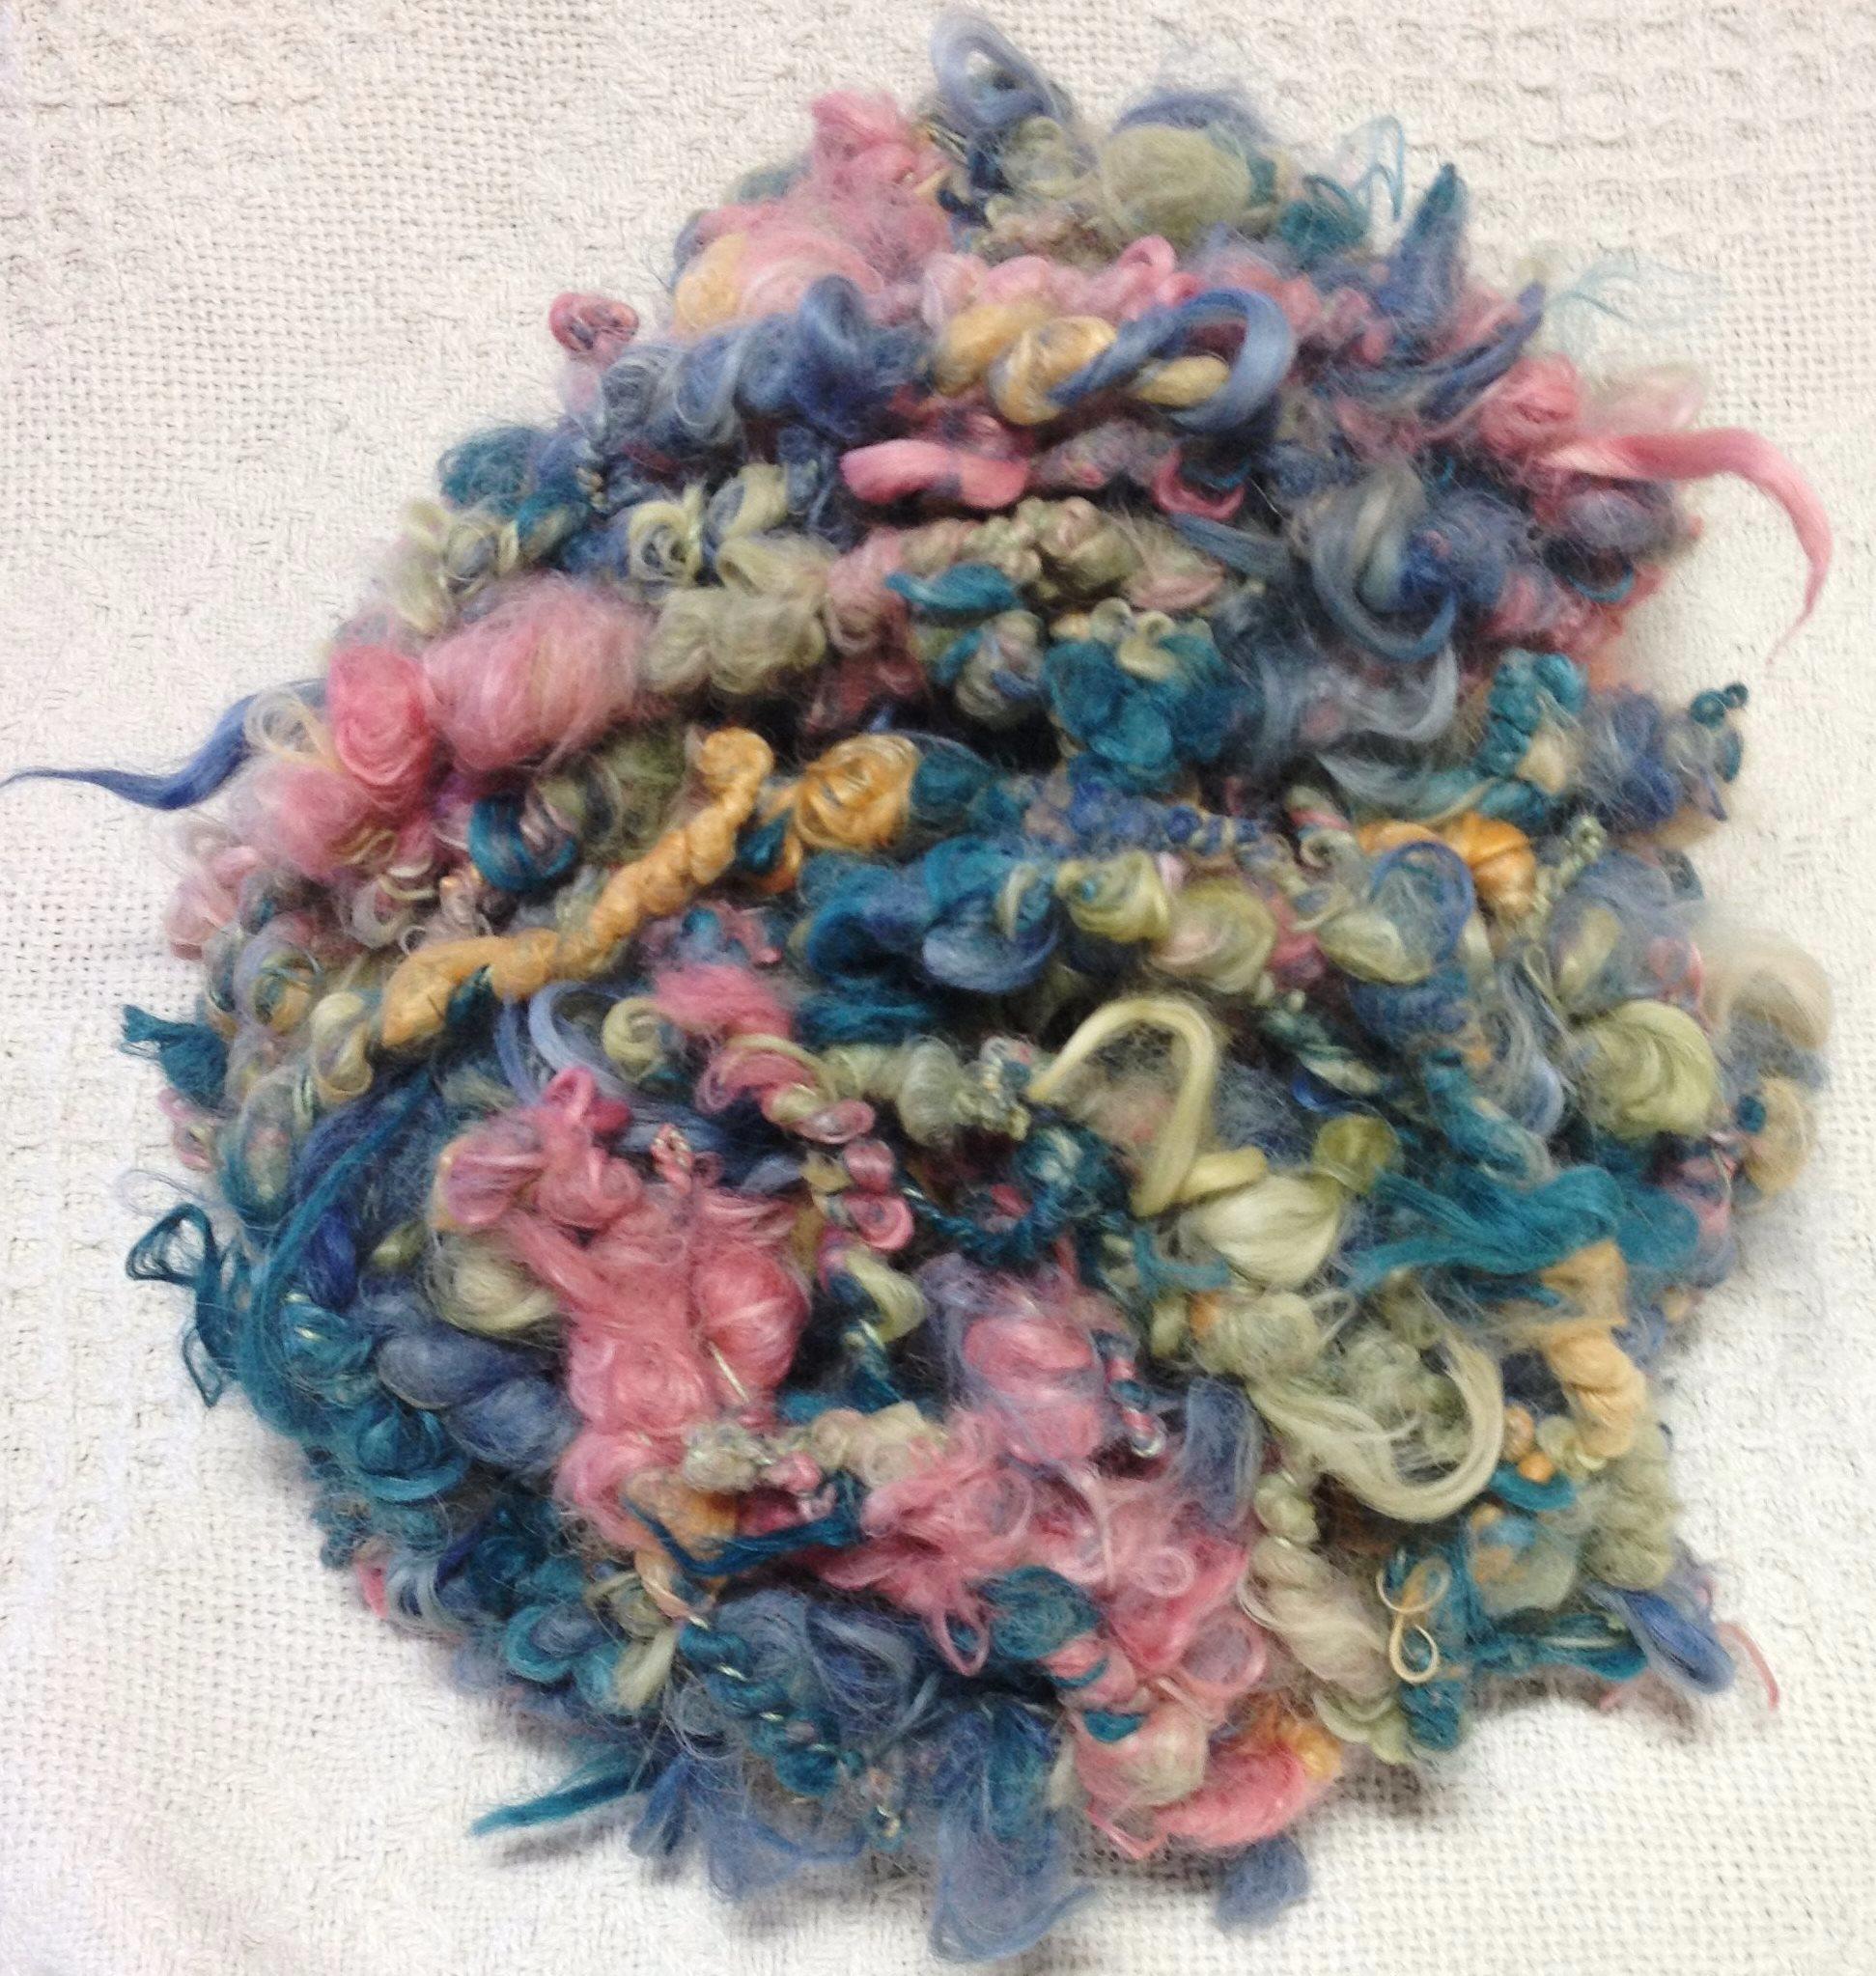 Surt Art Yarn - Citrus, Madder Orange, Cornflower, Lily, Ivy, Peppercorn 17742